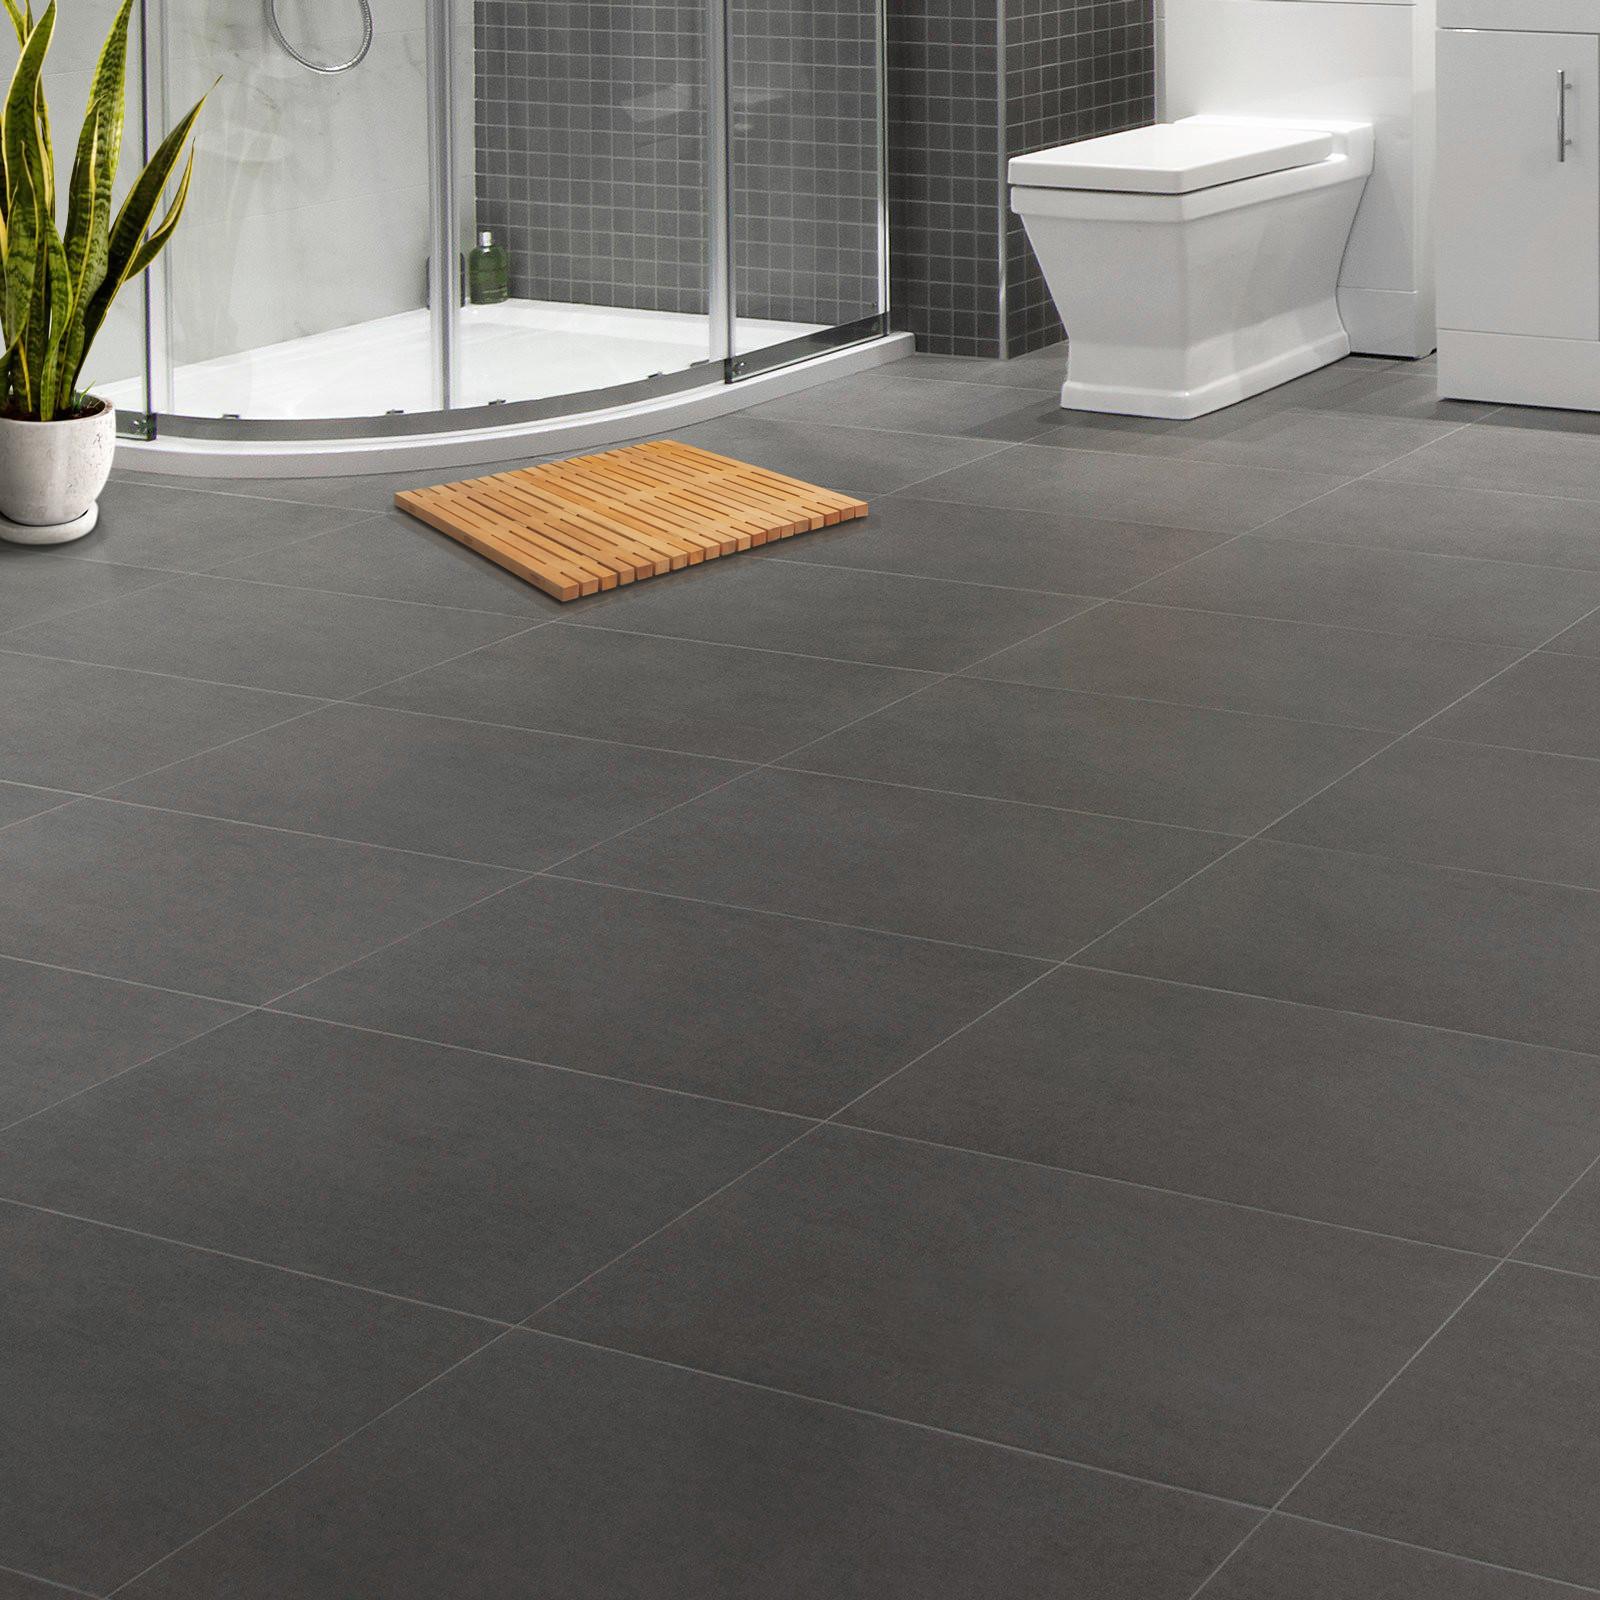 Kitchen Floor Over Tile